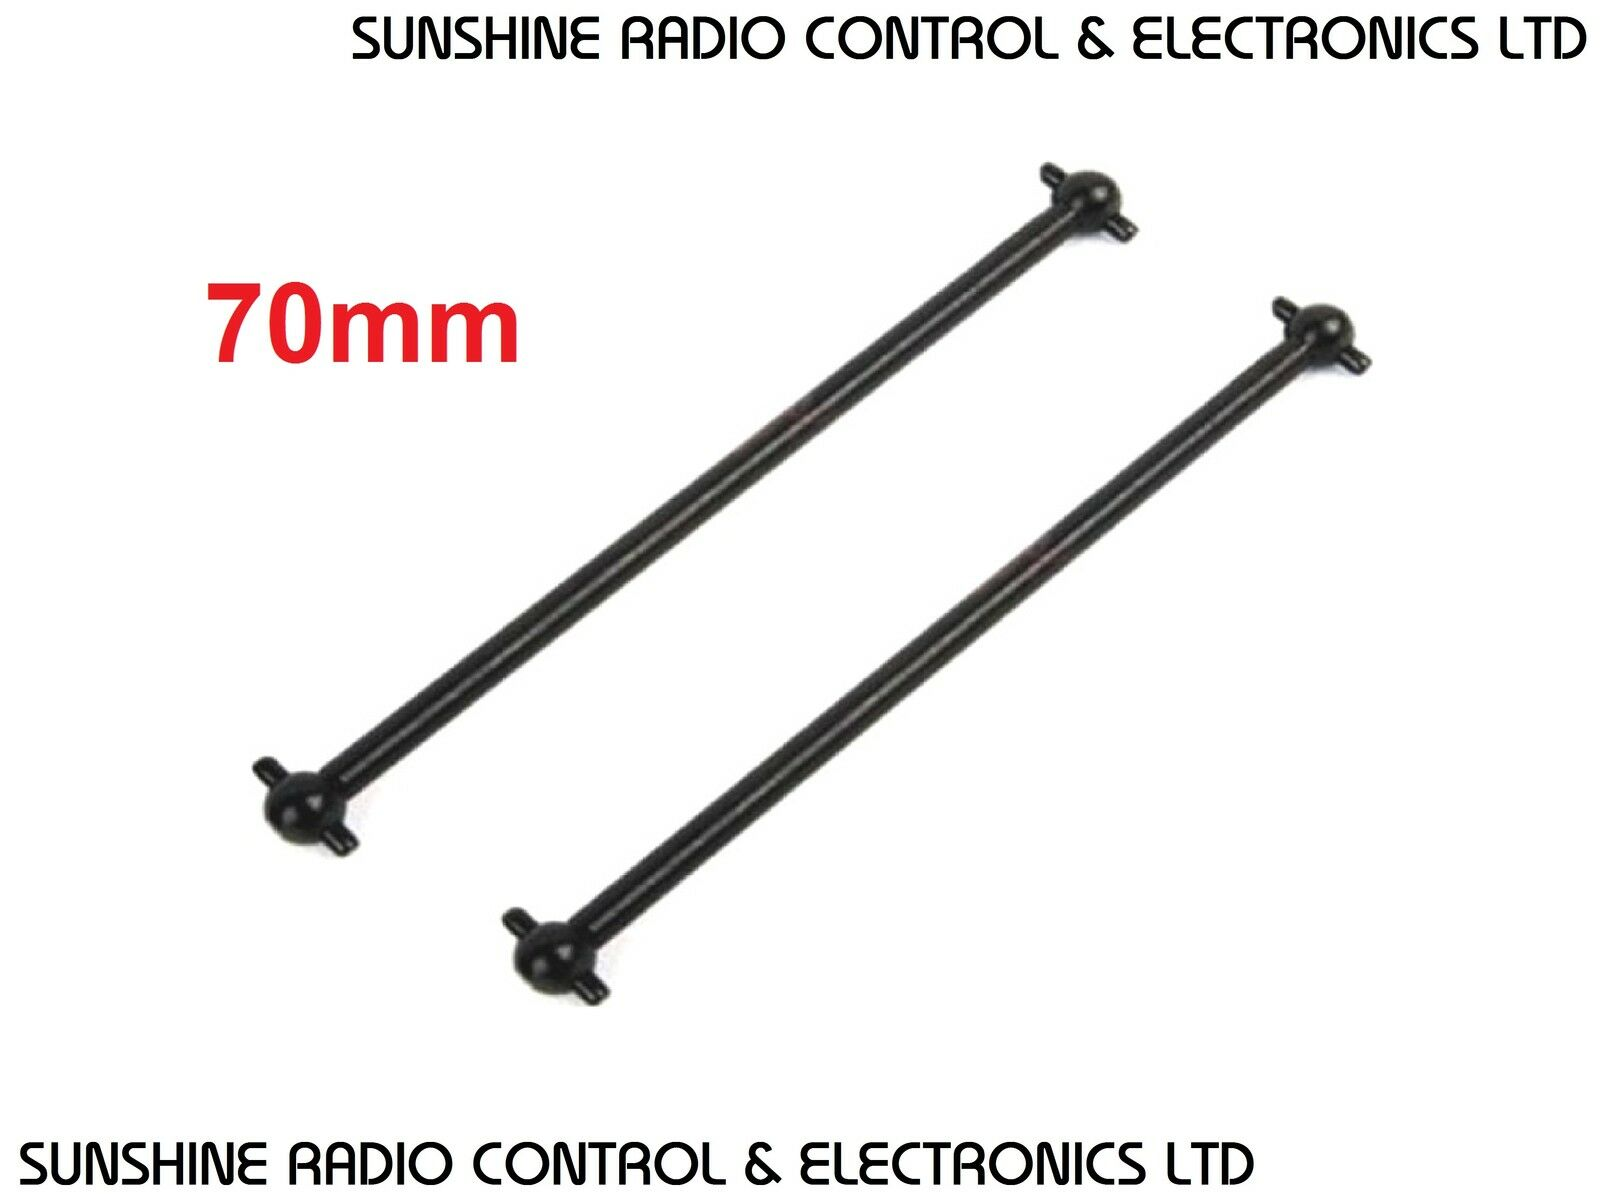 rc drive shafts x2 70mm long dog bone shaft 63mm pin to pin 6mm ball diameter uk